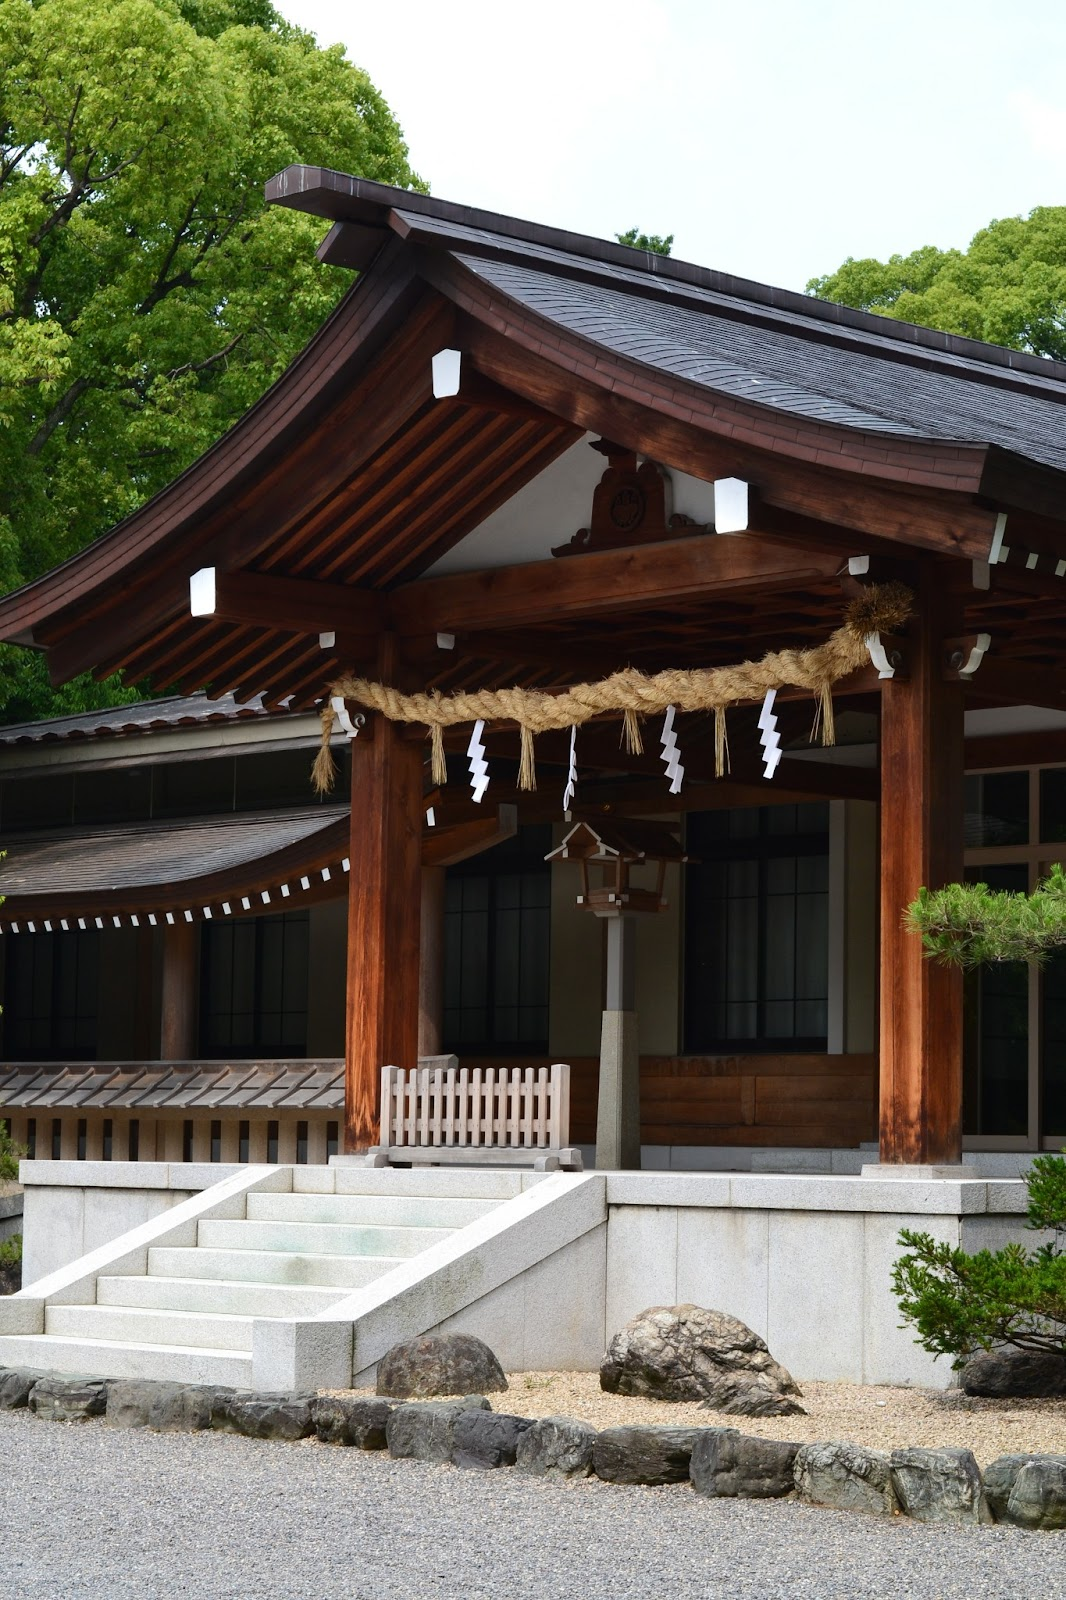 Victoria In Japan Land: Atsuta Shrine: The Main Shrine